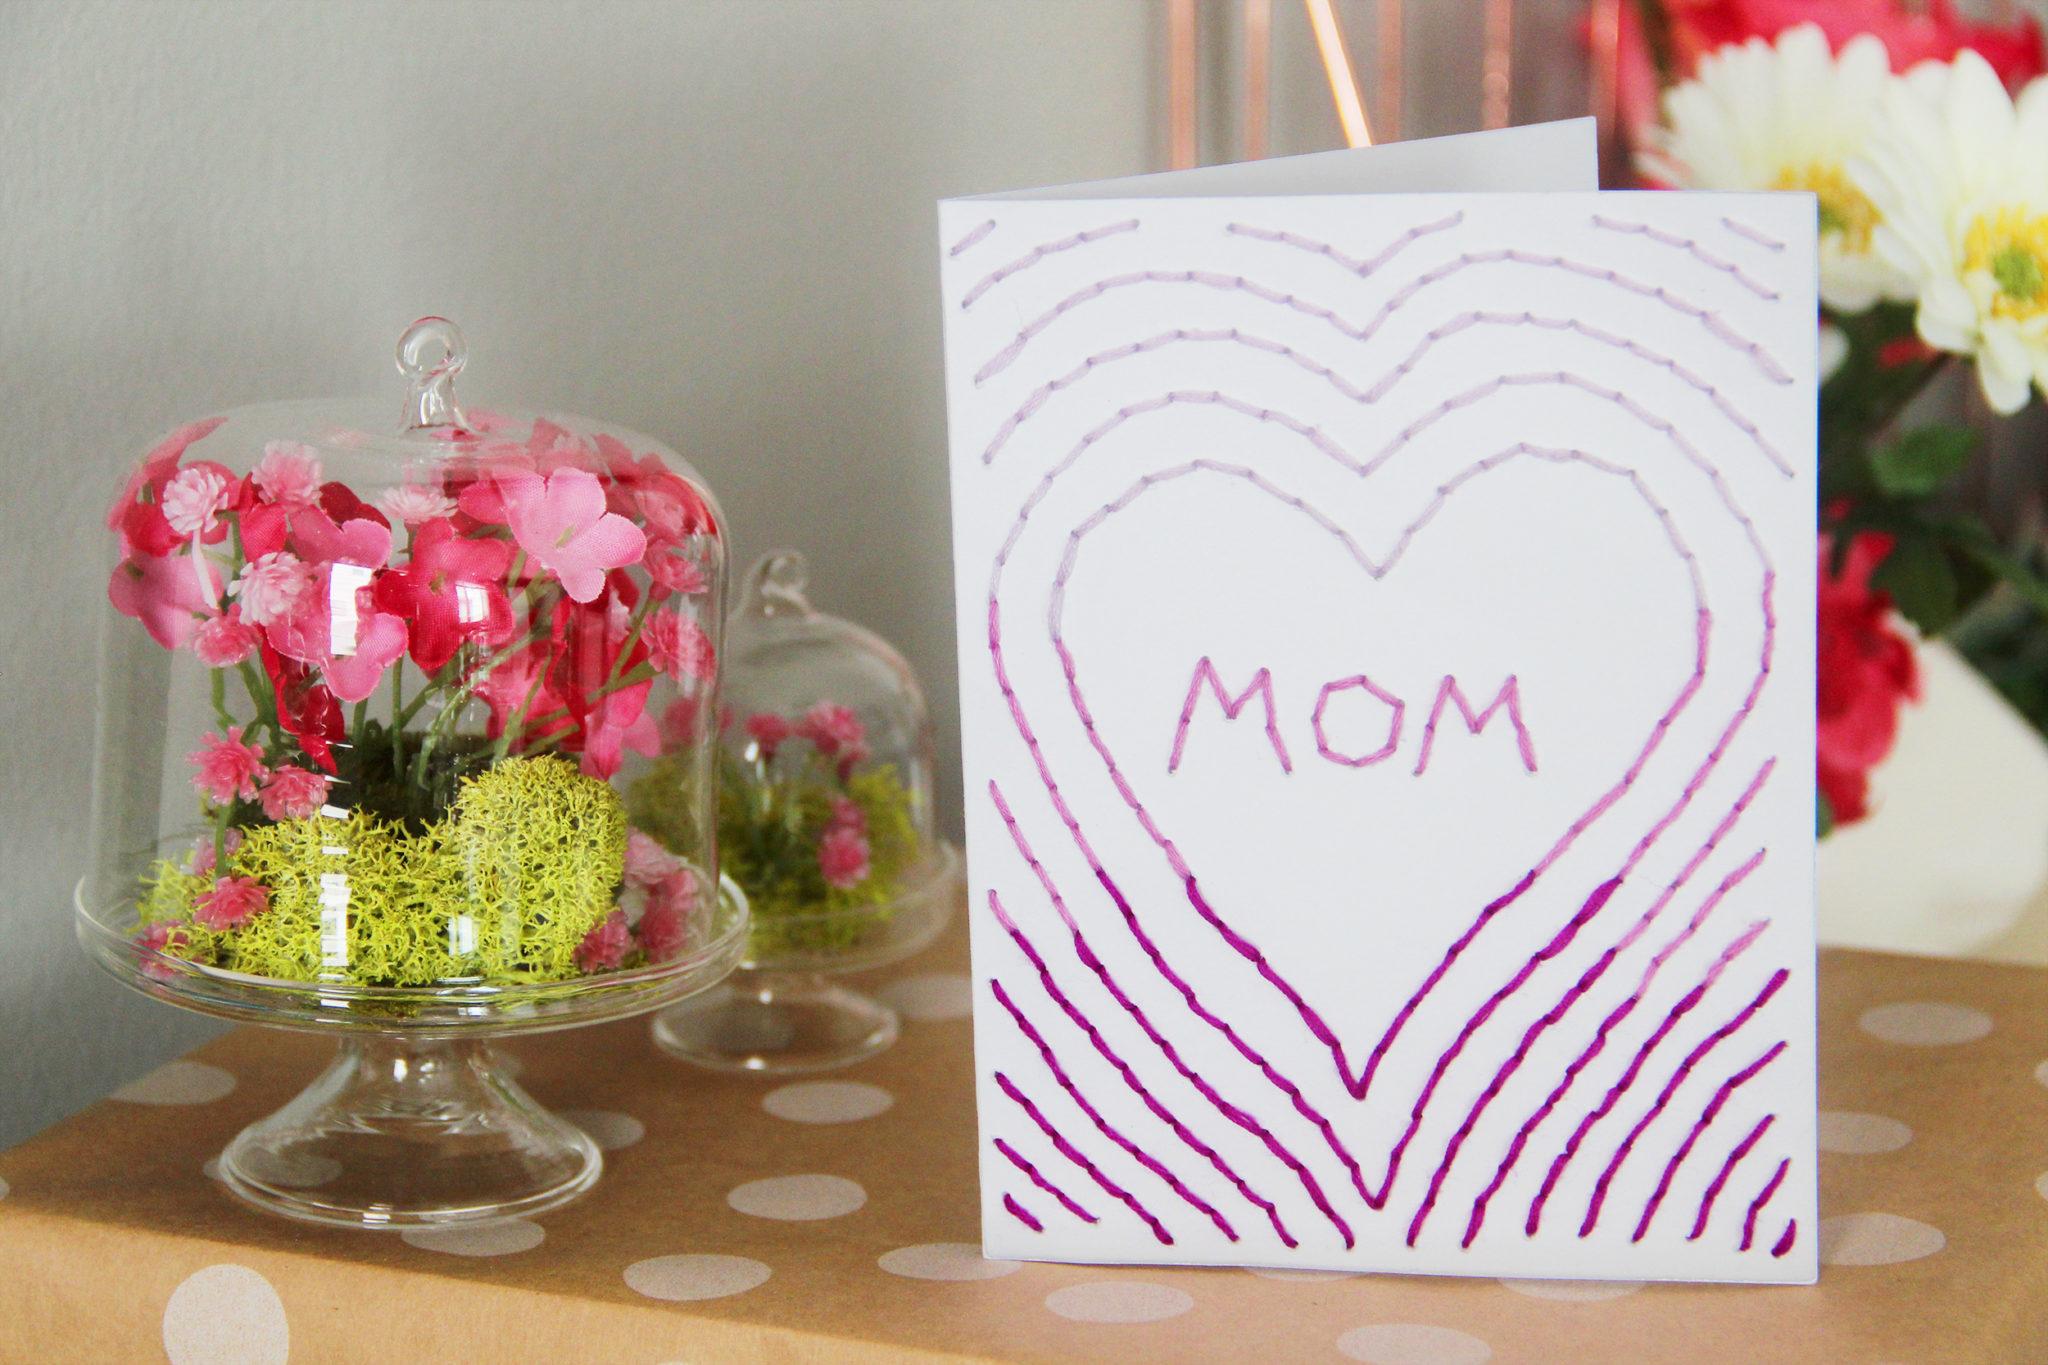 Superb Diy Embroidered Mothers Day Cards Karen Kavett Birthday Cards Printable Opercafe Filternl